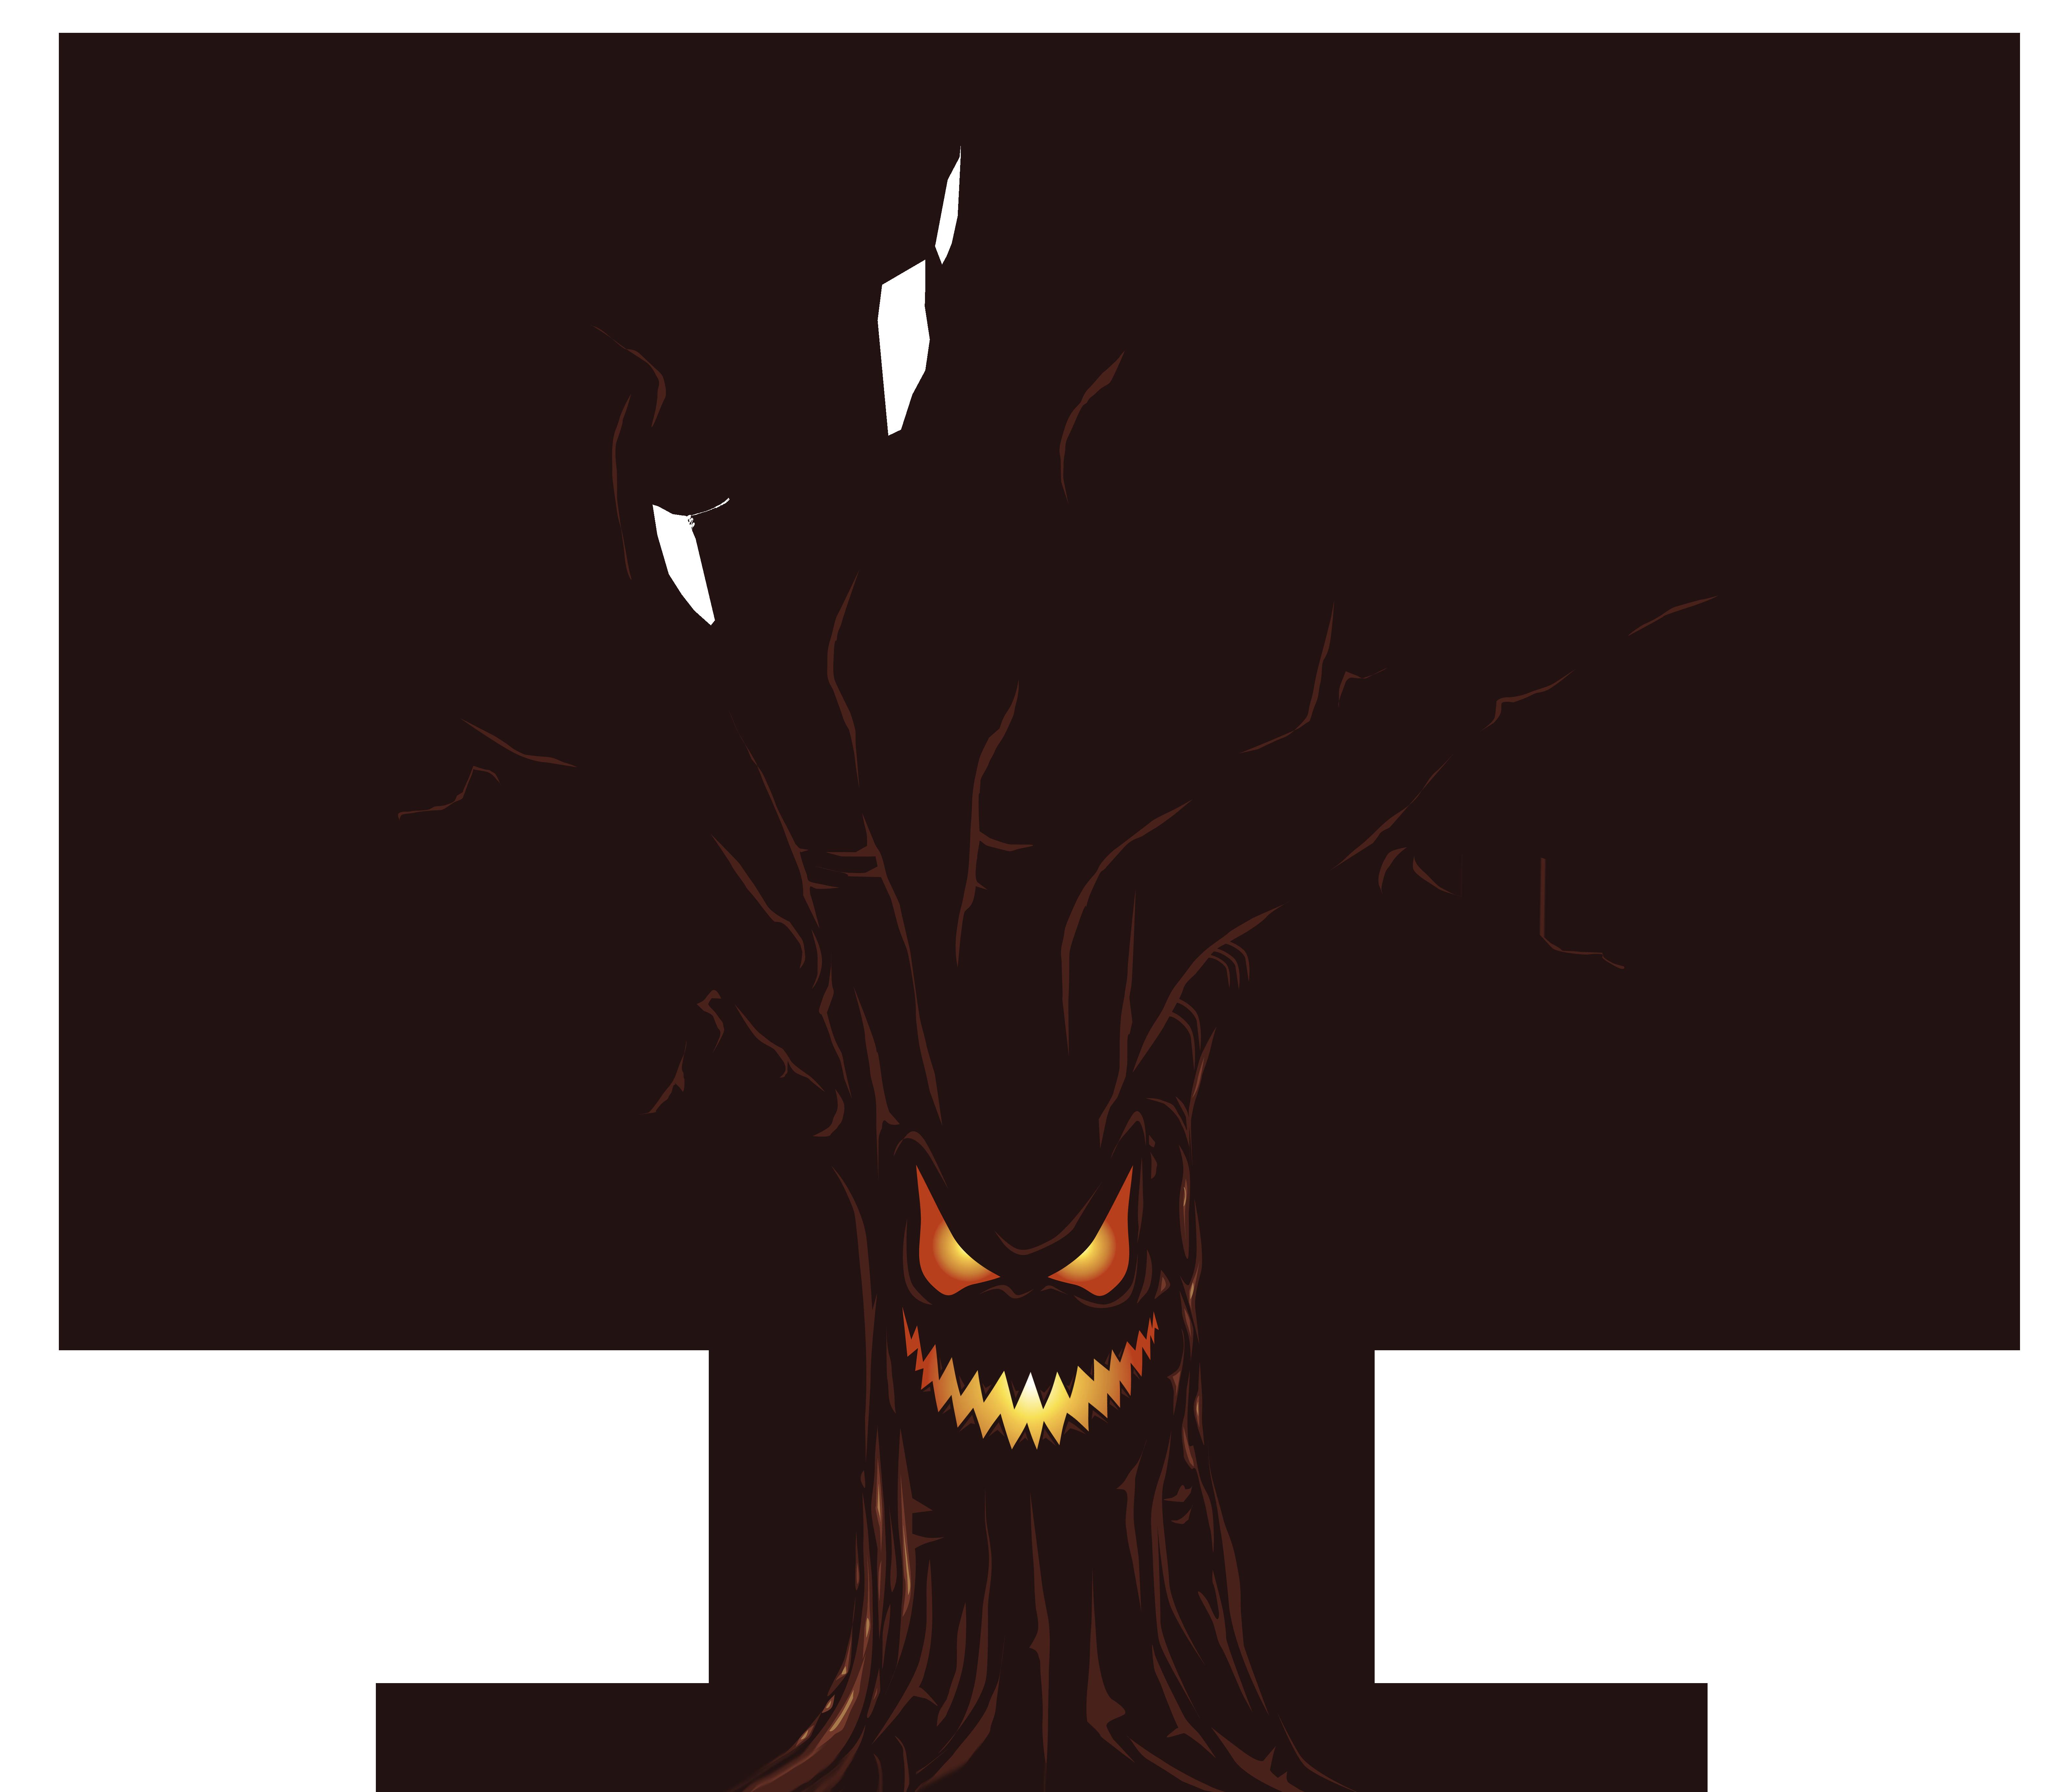 Spooky clipart transparent Spooky Clip Art Gallery PNG